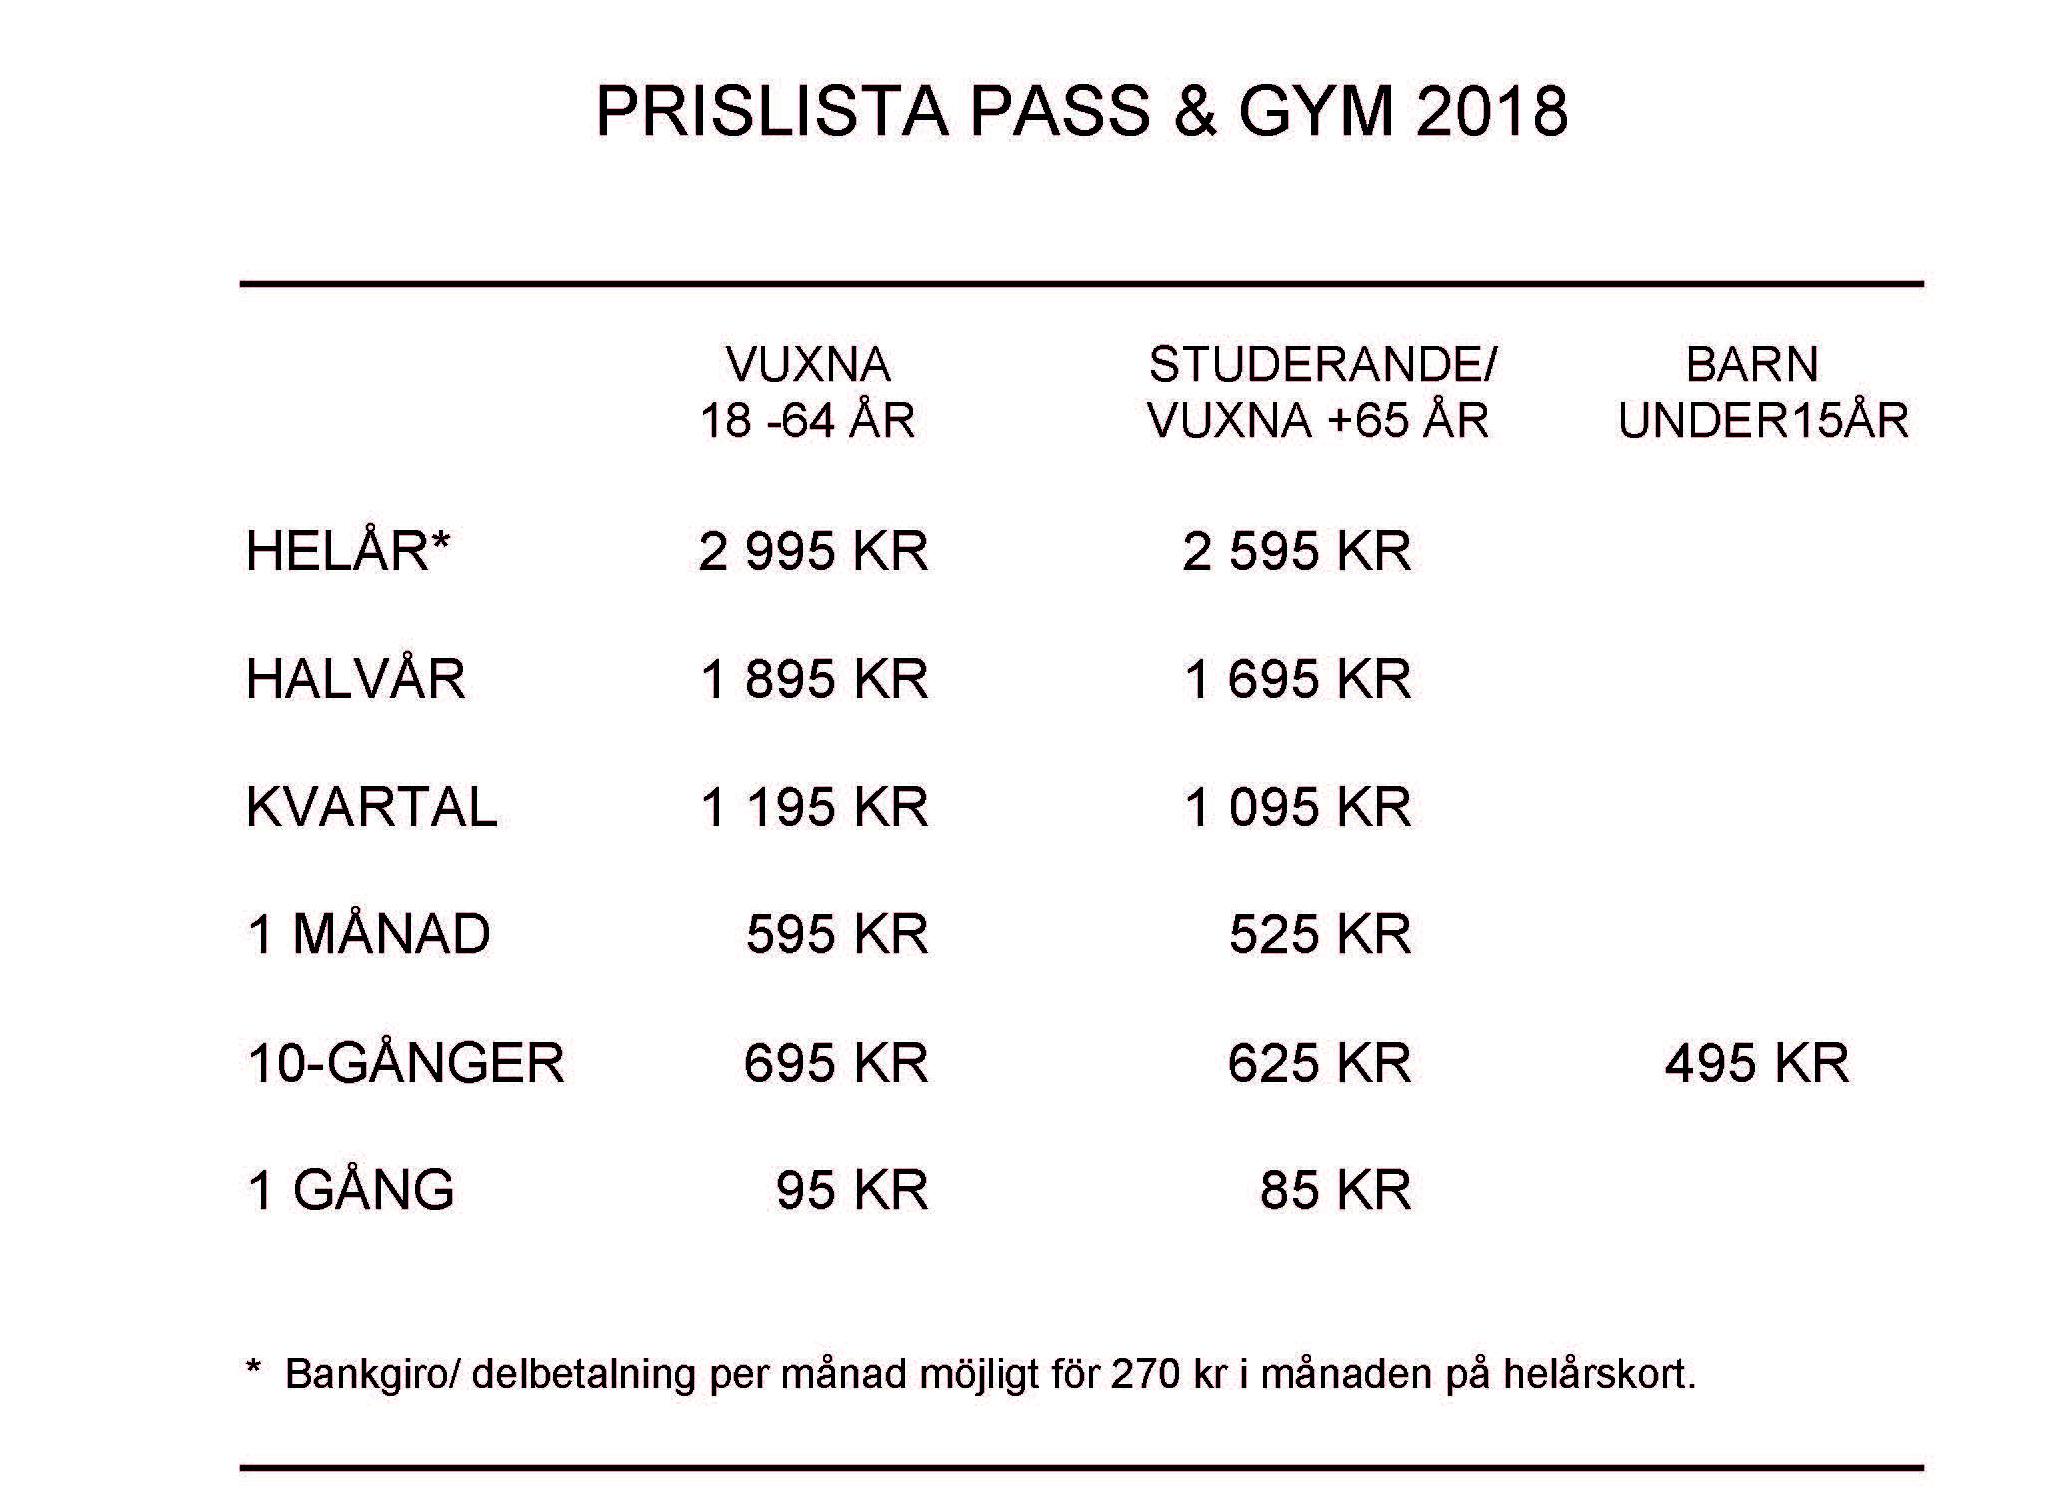 Prislista Pass & Gym 2018